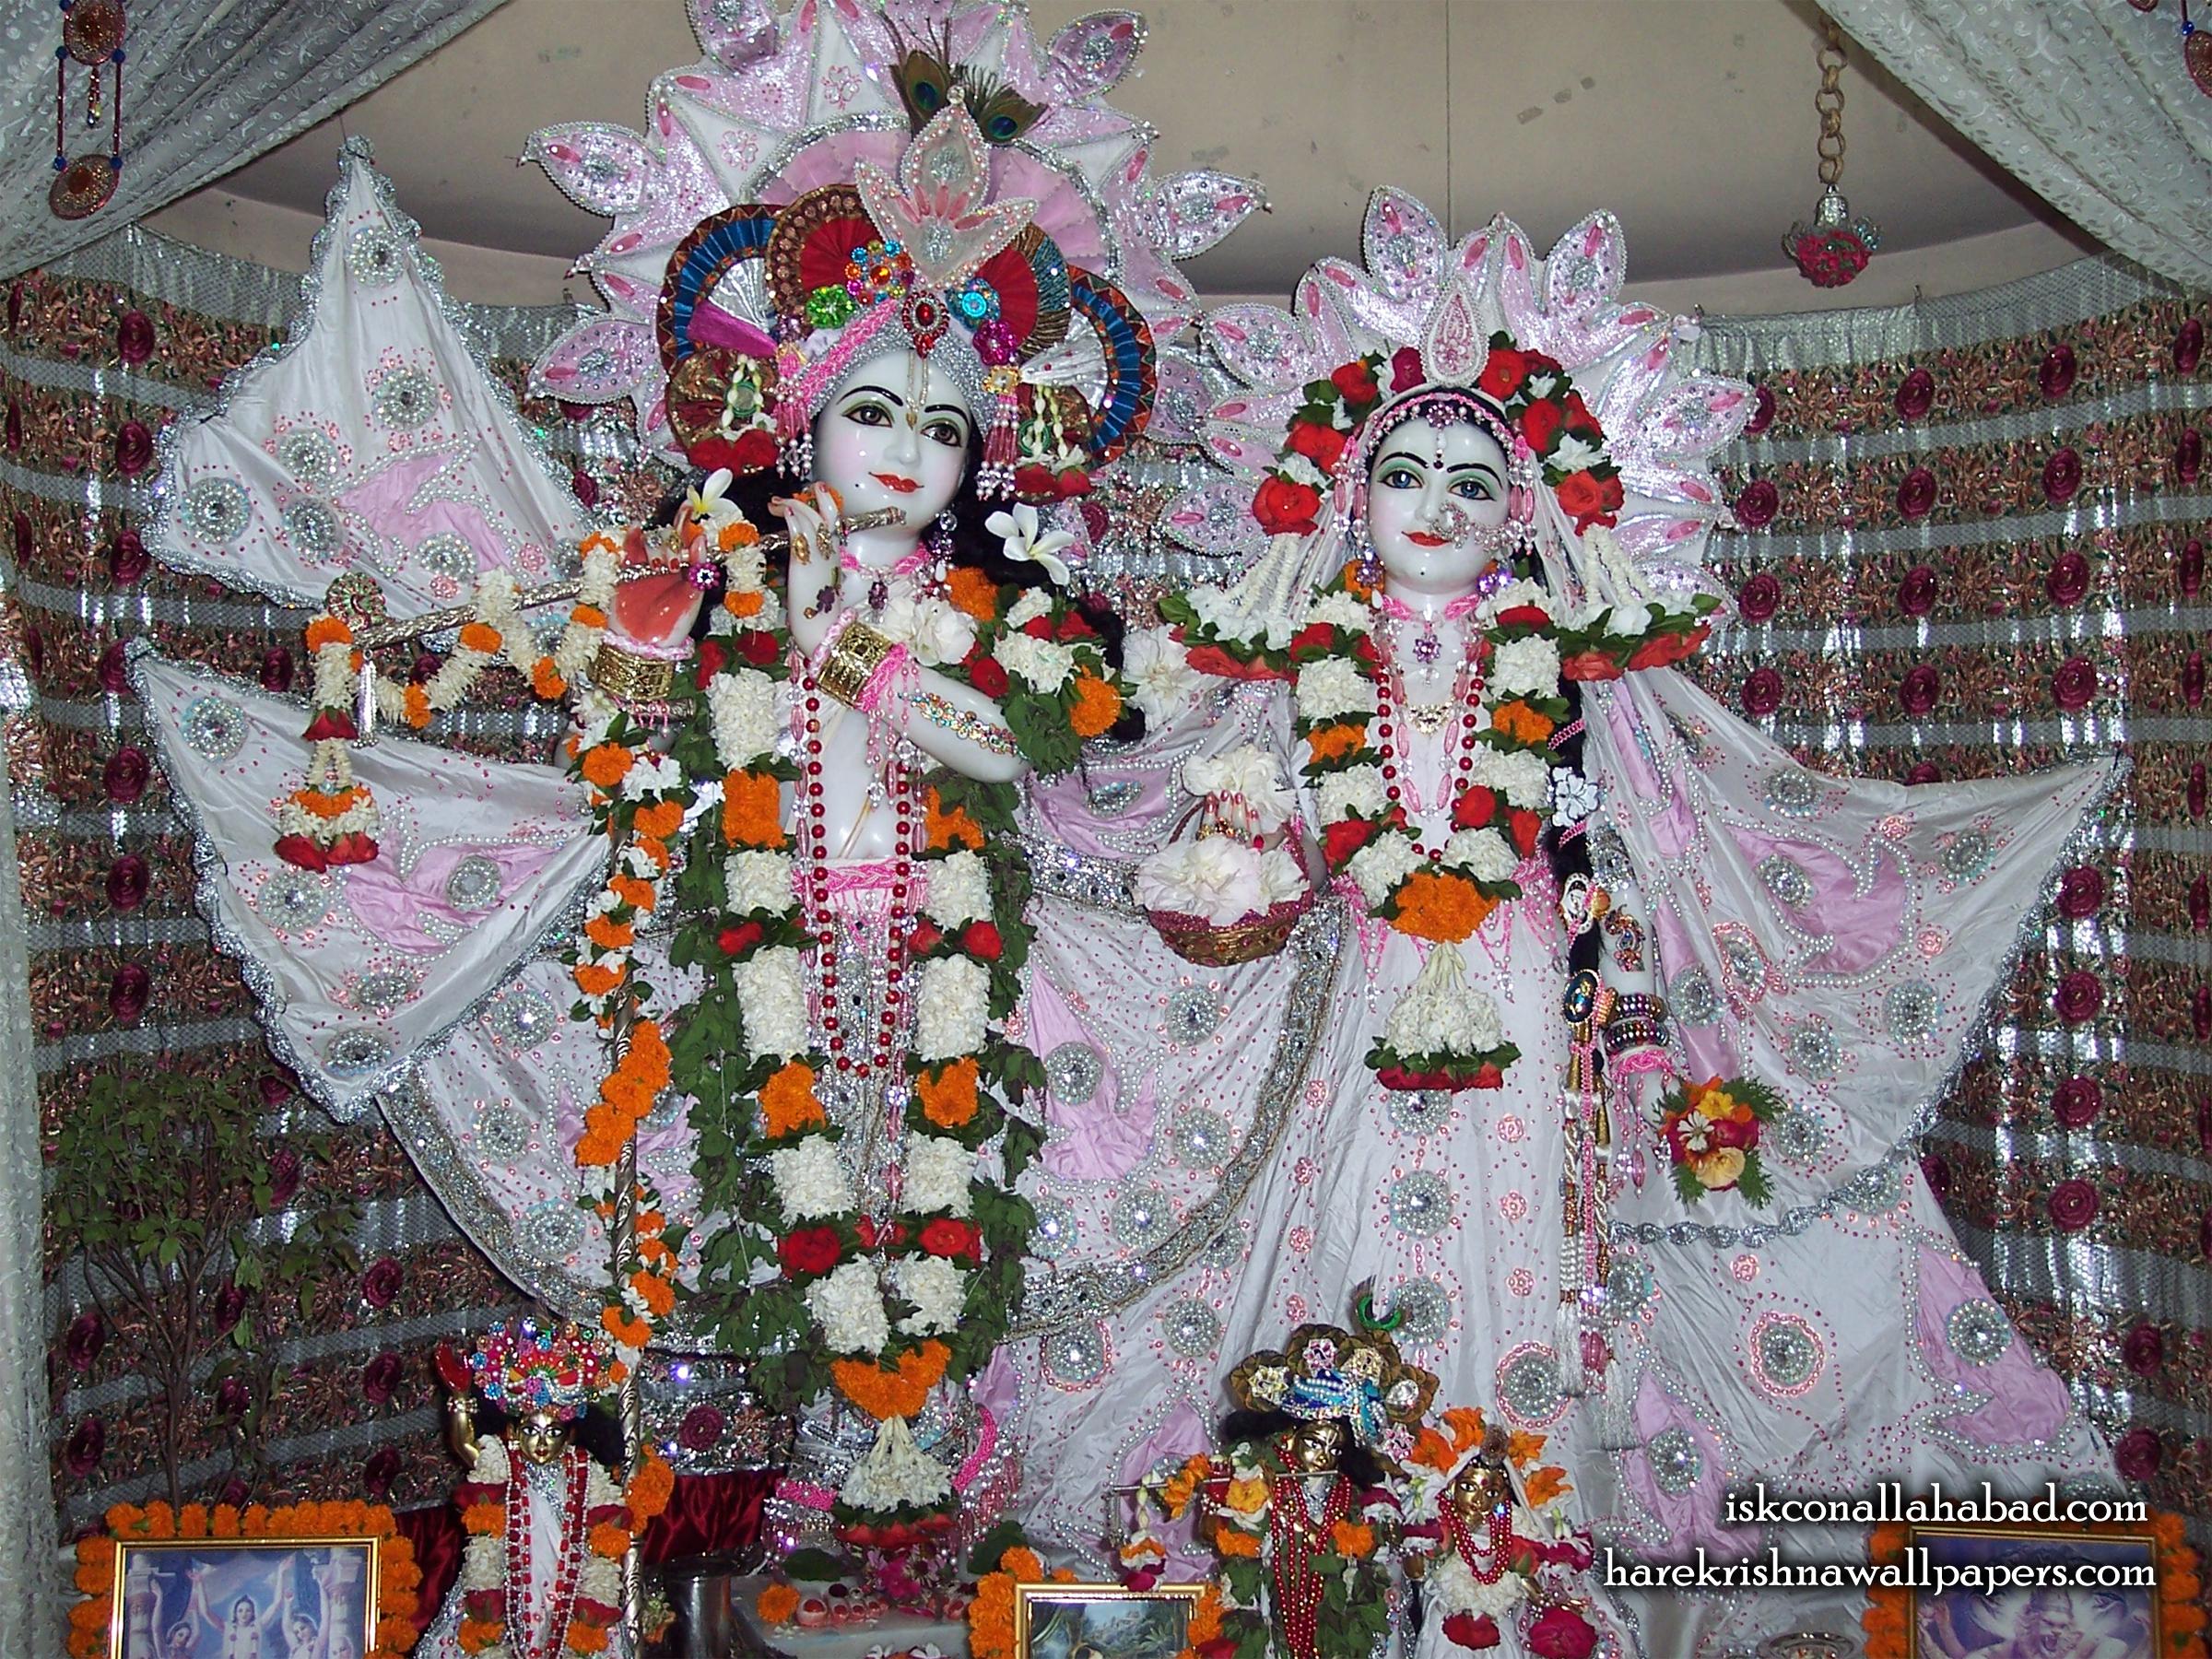 Sri Sri Radha Venimadhava Wallpaper (002) Size 2400x1800 Download